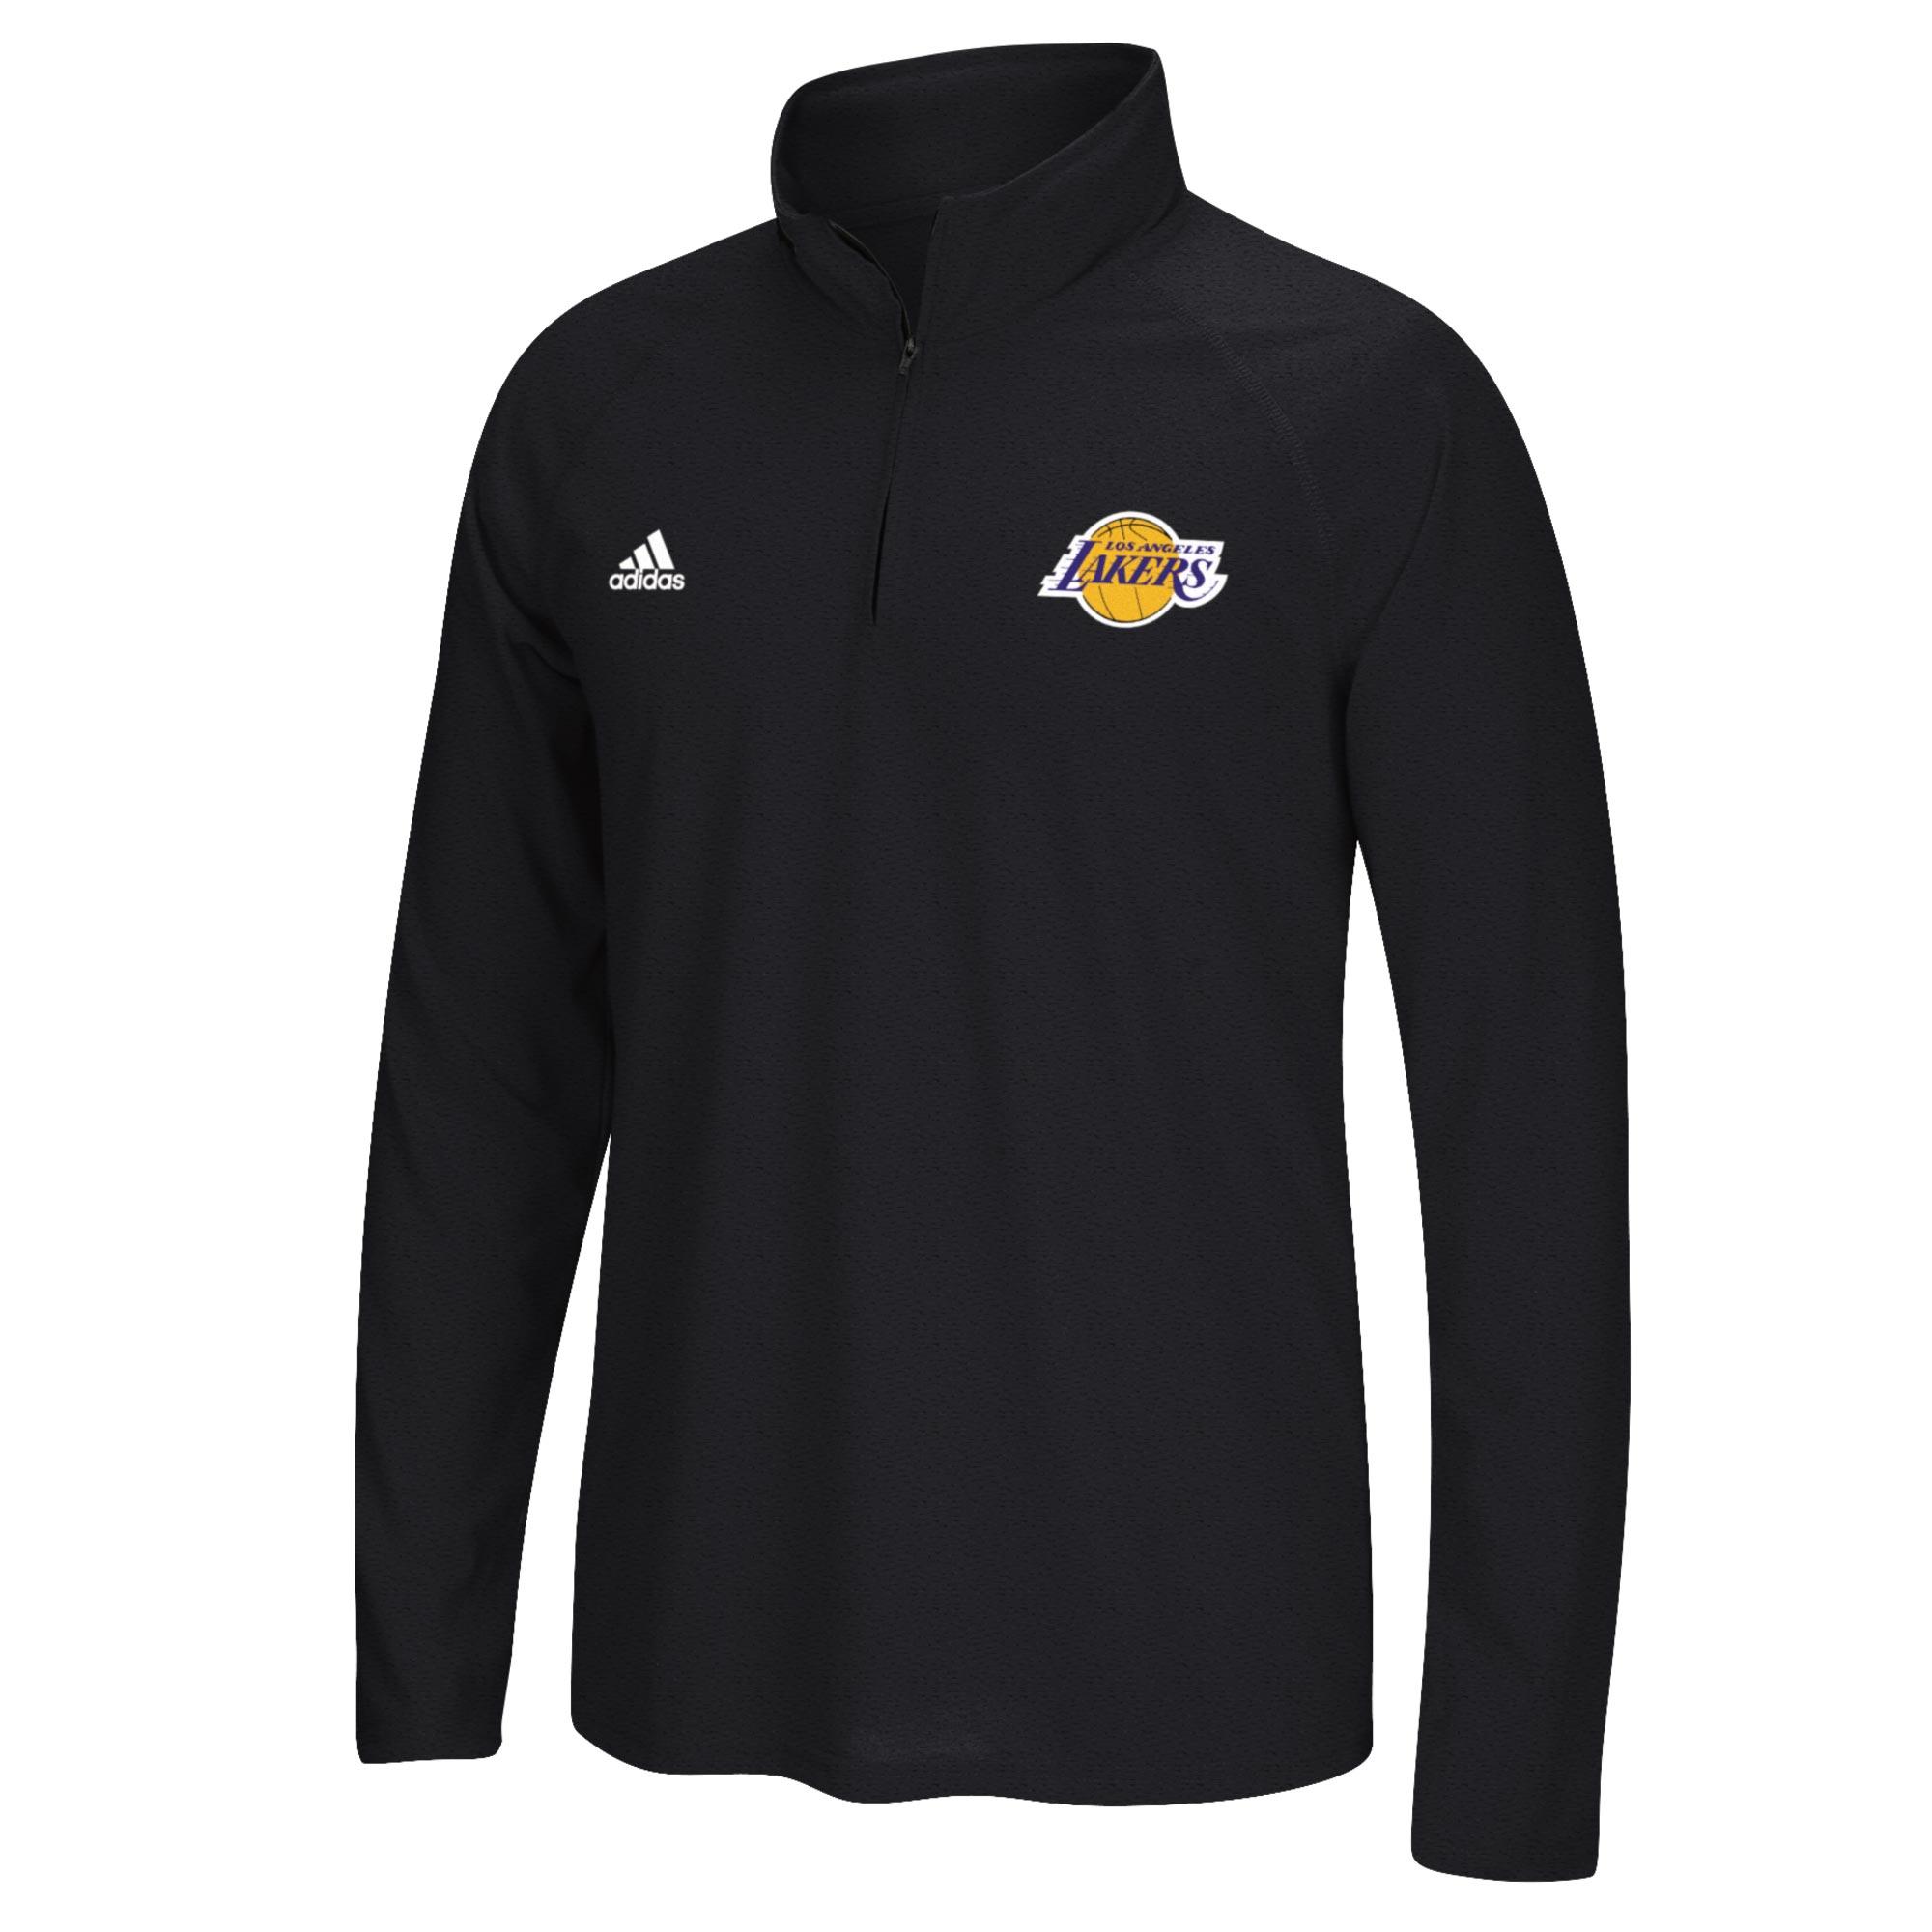 Los Angeles Lakers adidas Climalite 1/4 Zip Top - Mens